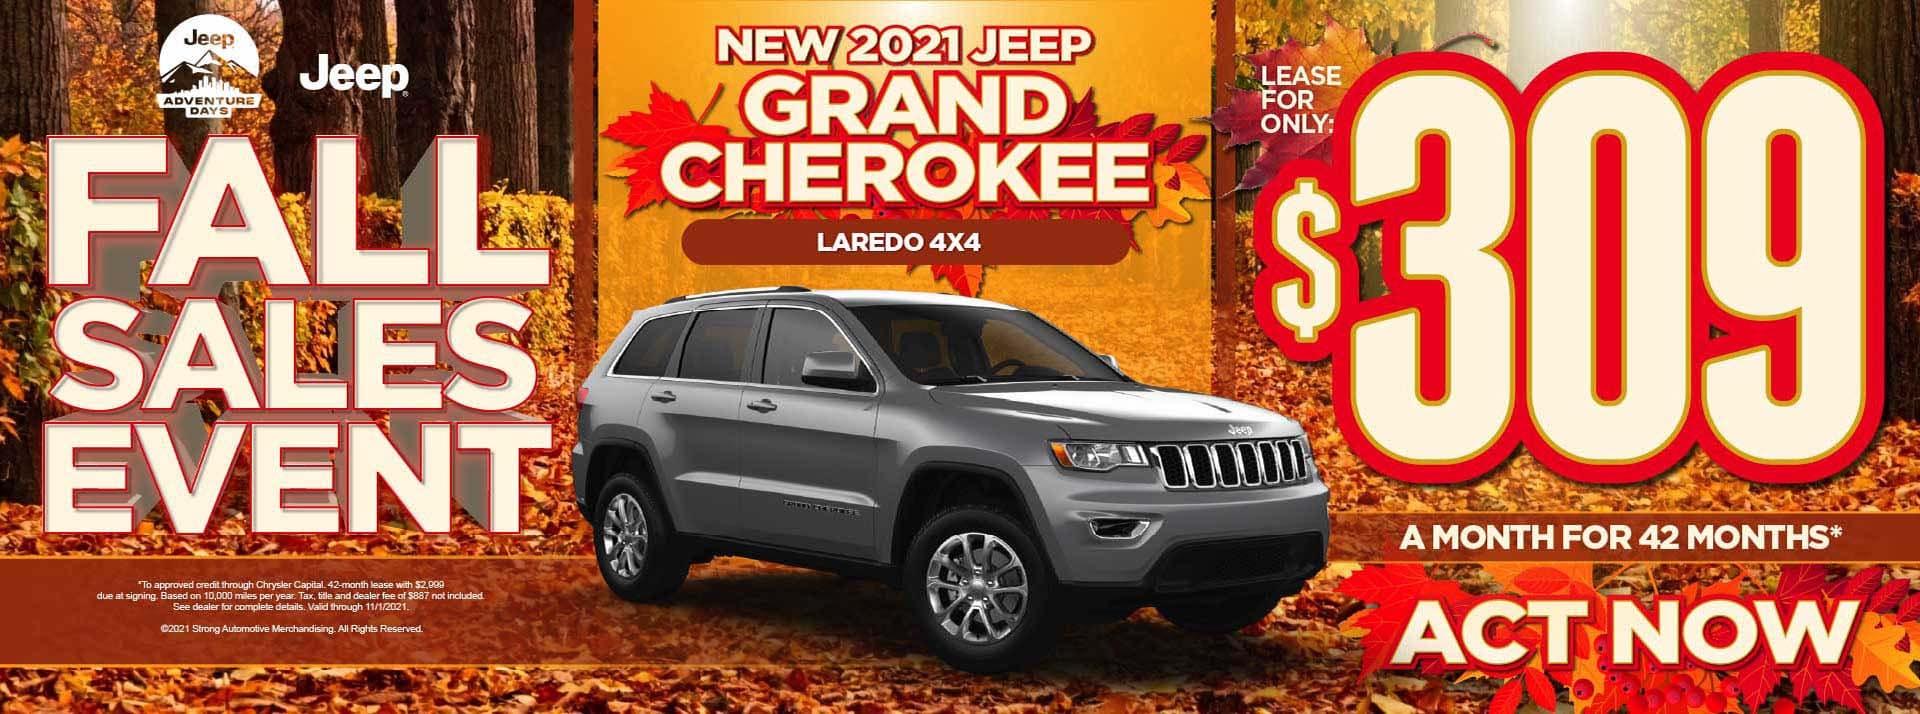 New 2021 Jeep Grand Cherokee Laredo 4x4 - $309 / mo ACT NOW